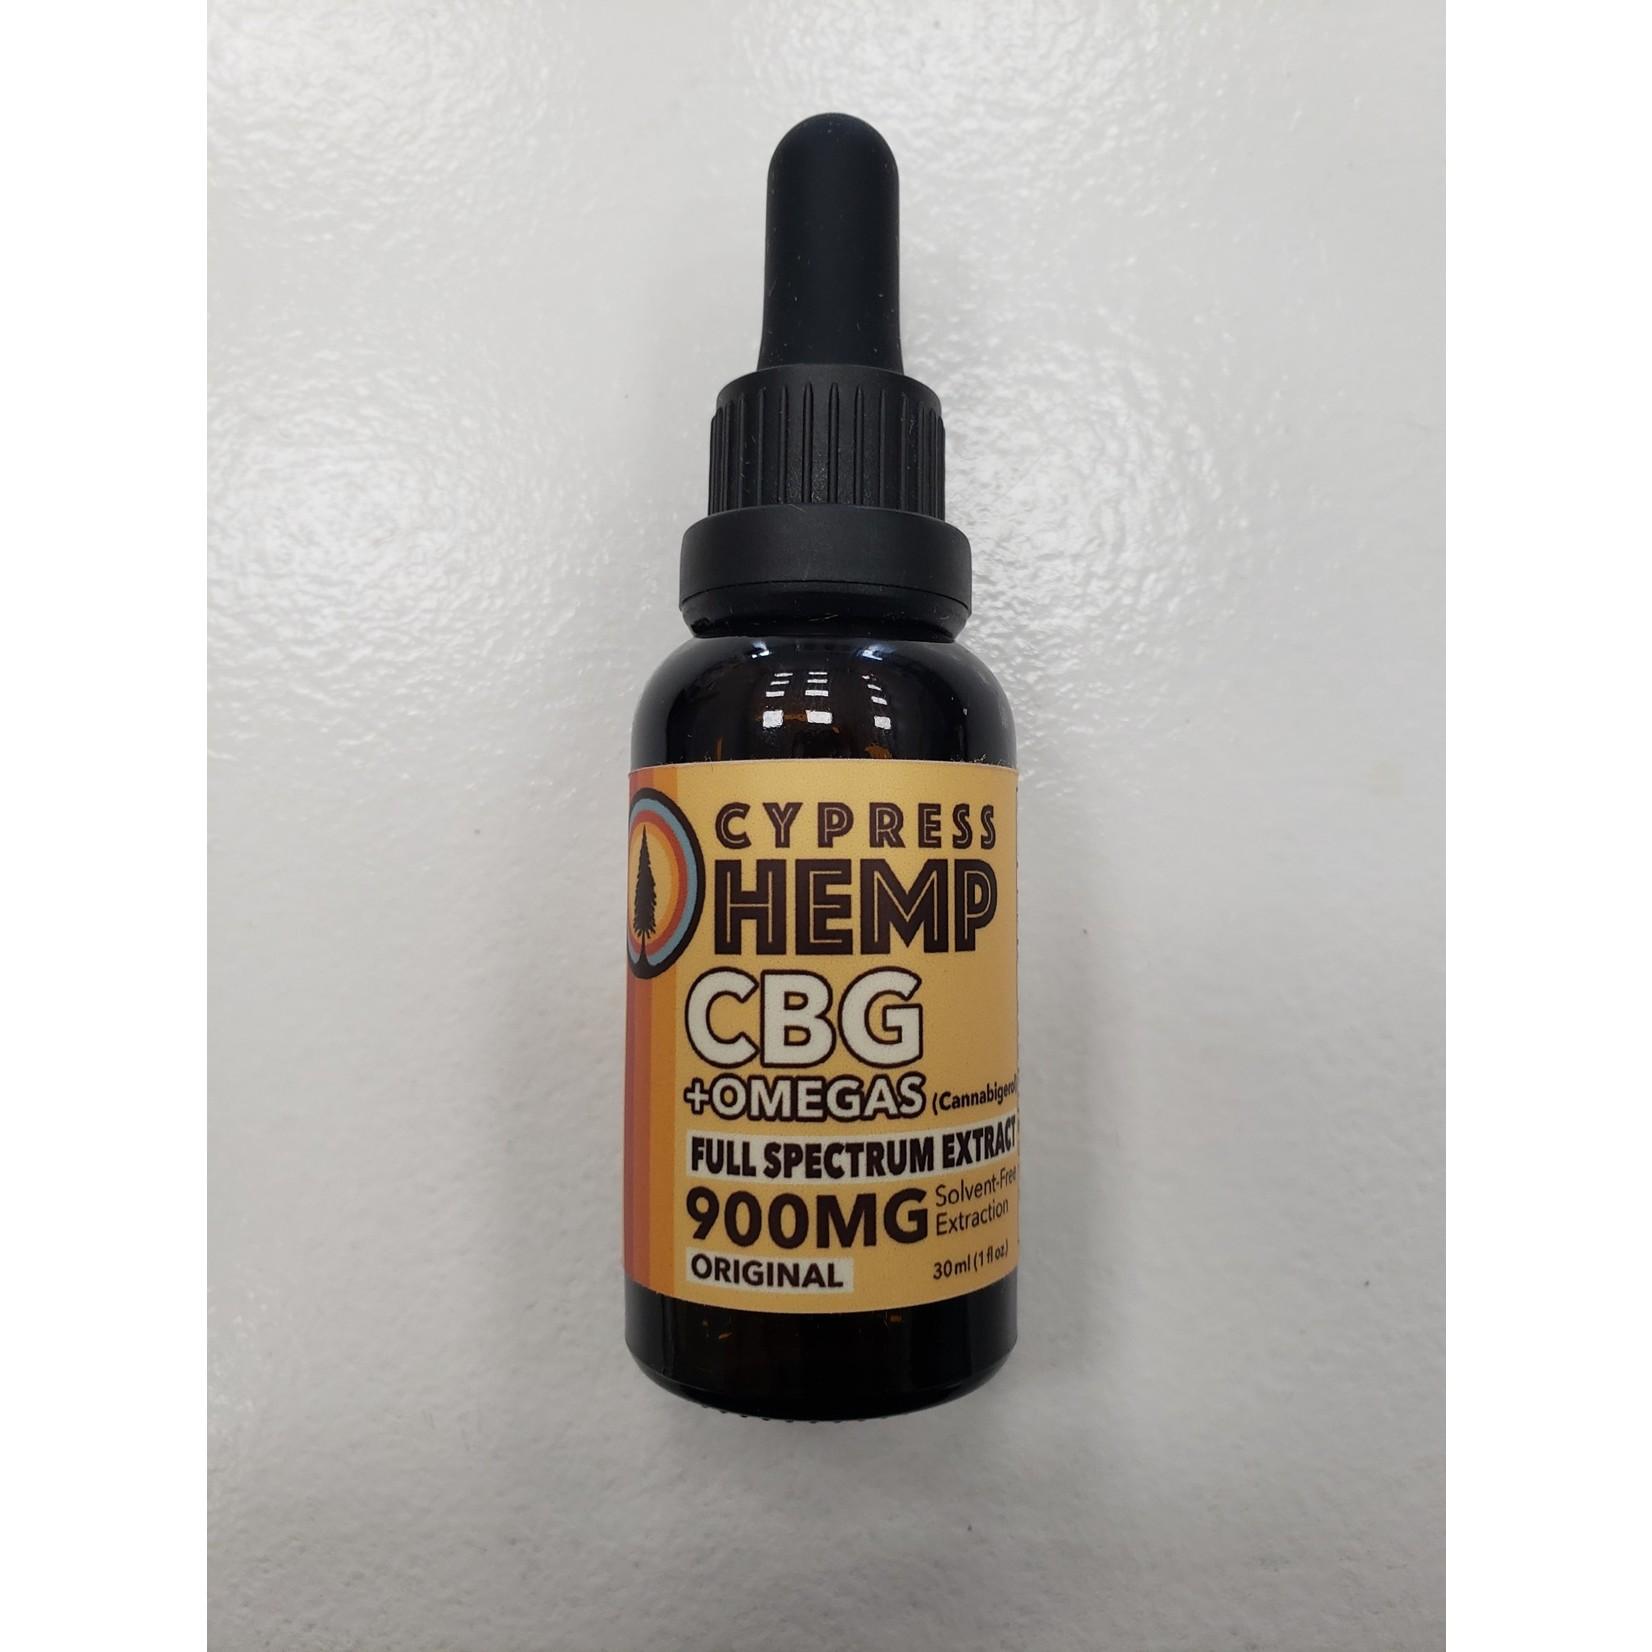 Cypress Hemp CBG + Omegas Full Spectrum